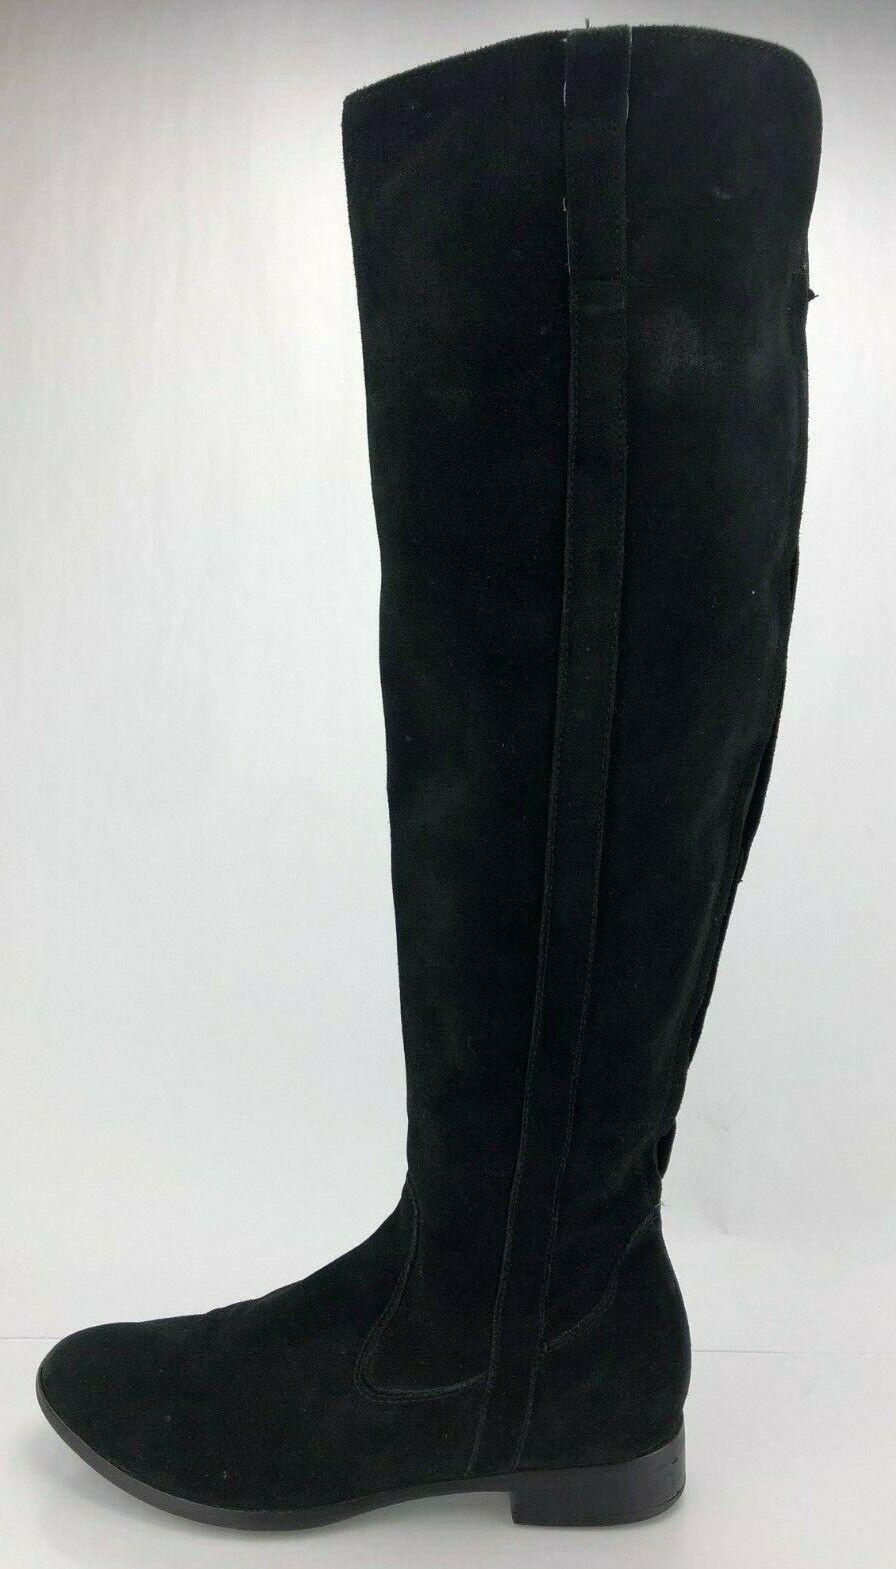 Clarks botas Gamuza Negra De Cremallera cómoda Alto Zapato de moda informal sobre la rodilla mujeres 8 M